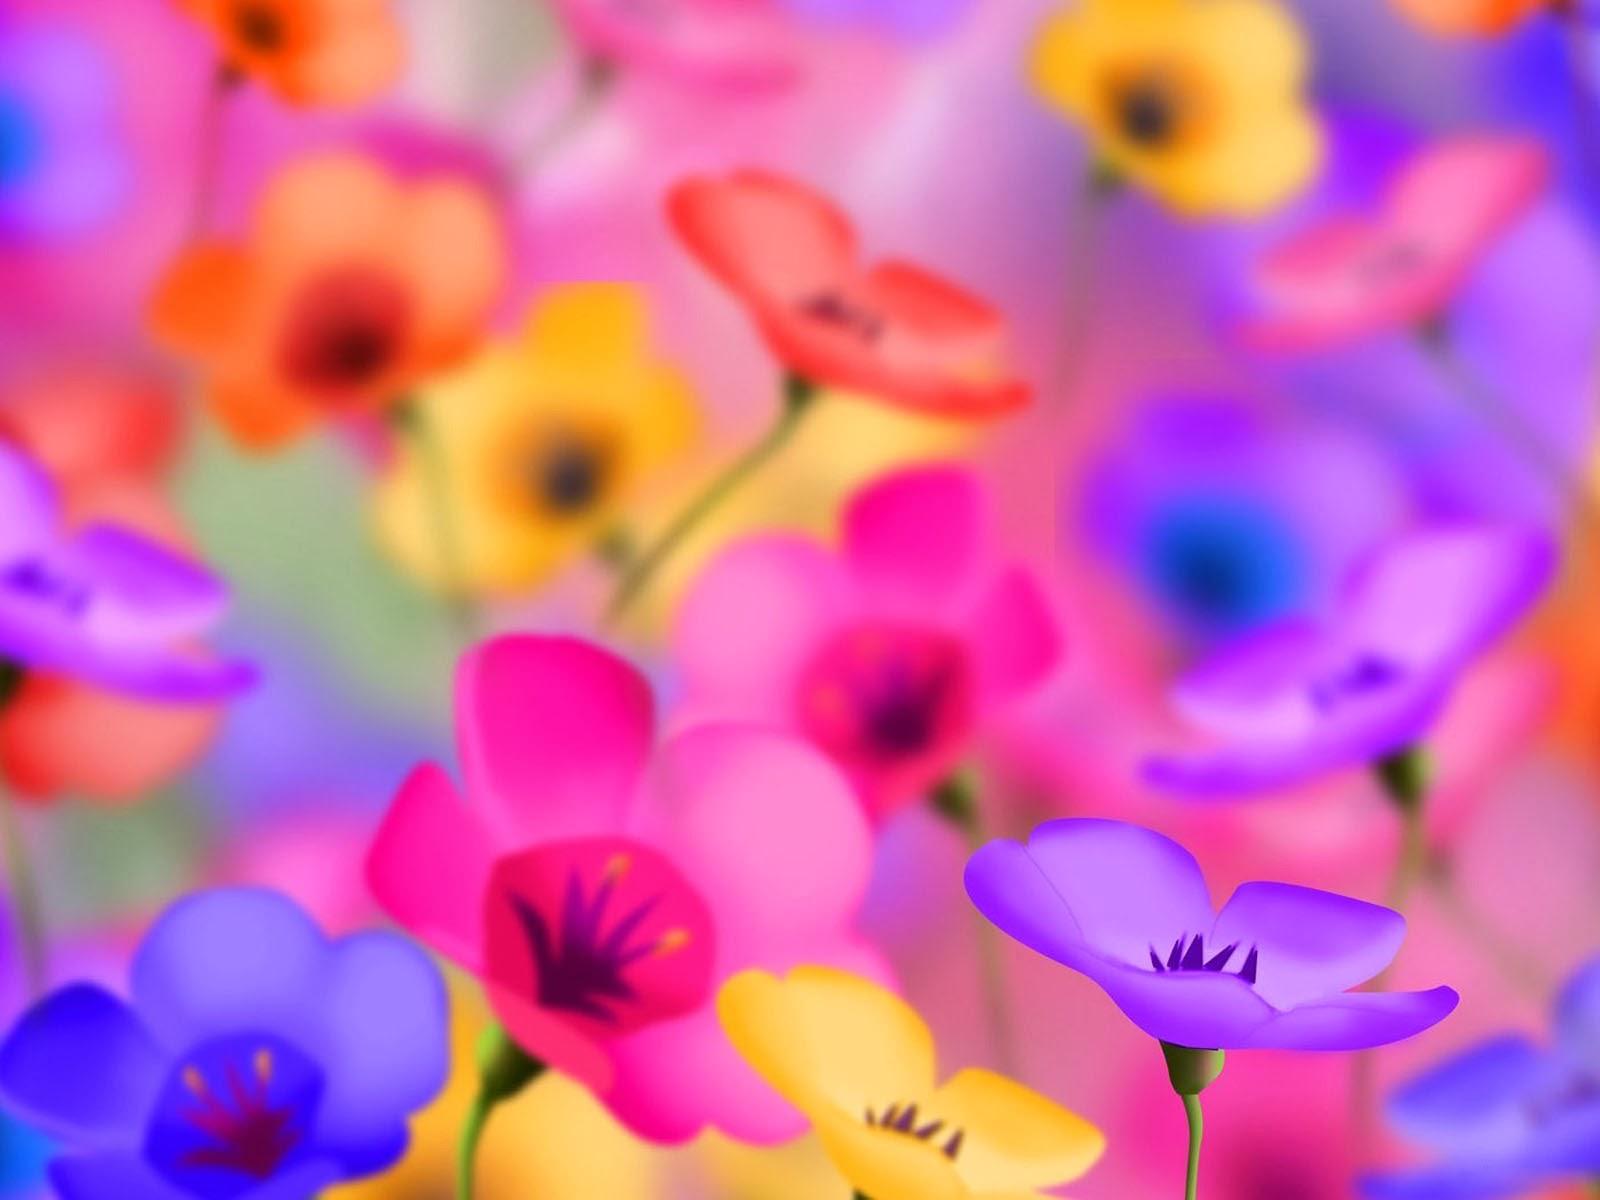 floral desktop wallpaper,petal,flower,purple,violet,plant